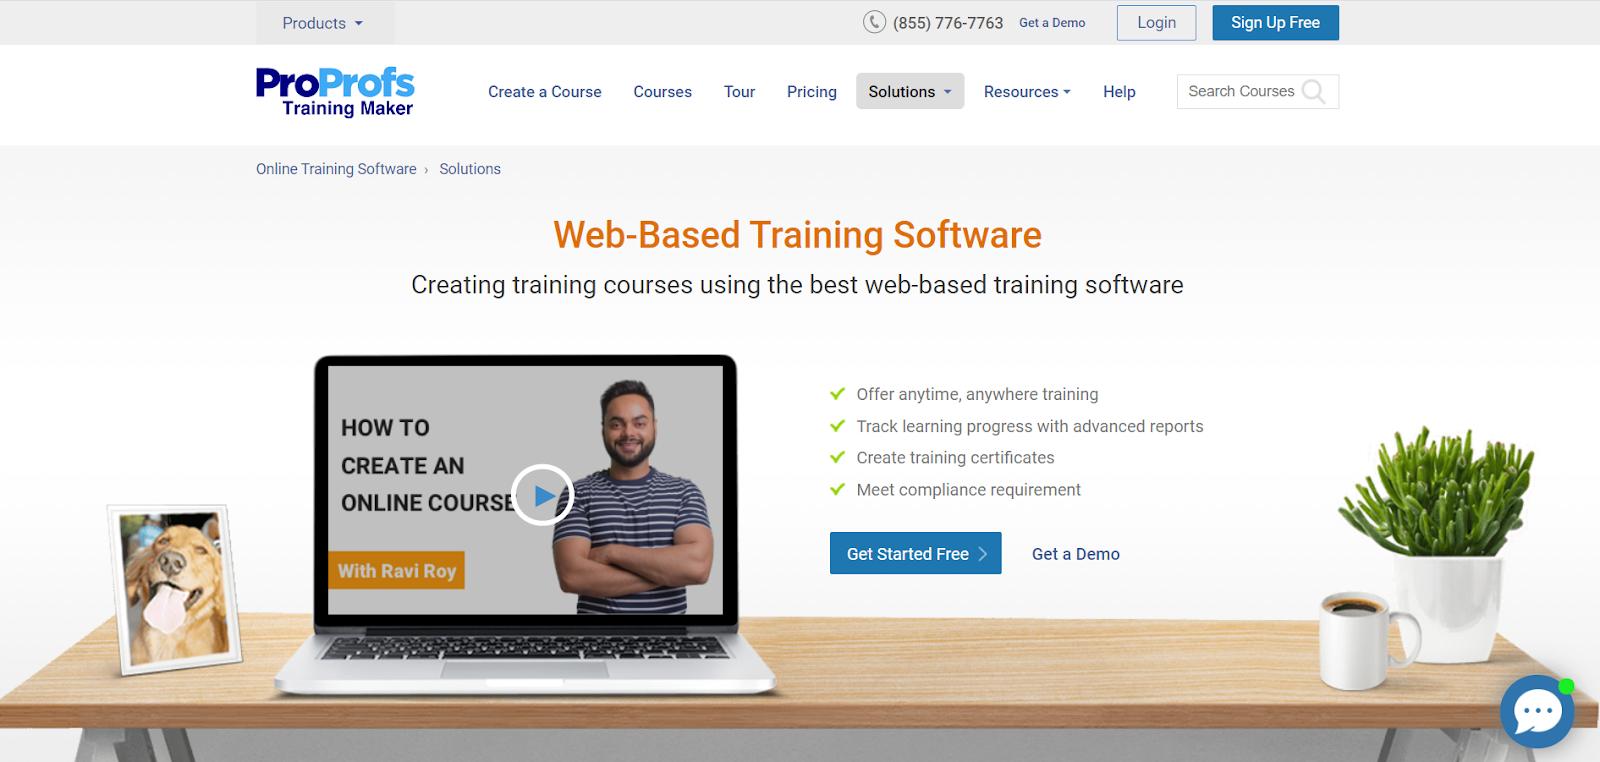 ProProfs Web-Based Training Software